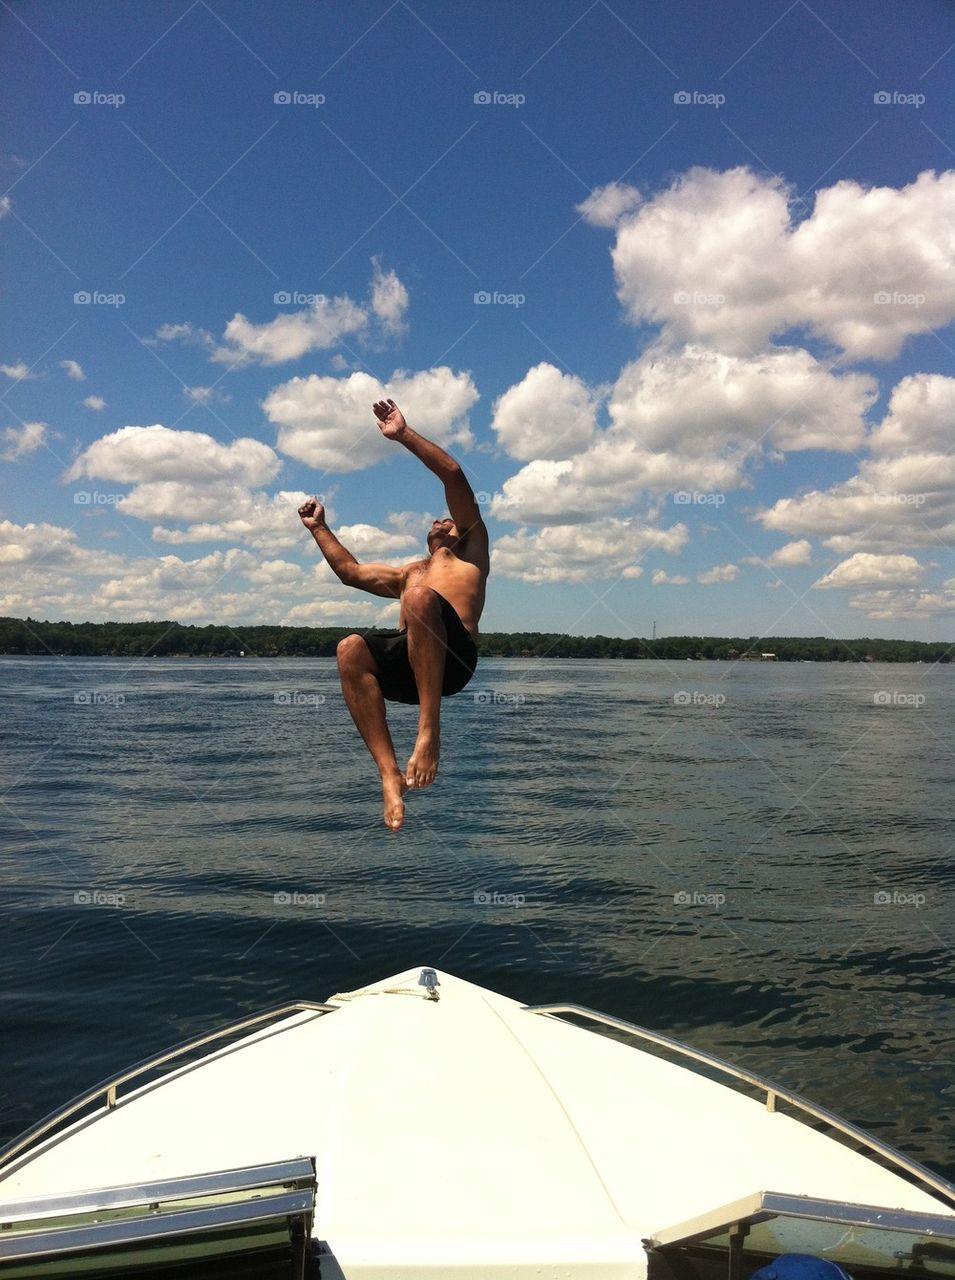 water   recreation, leisure, water sports, travel